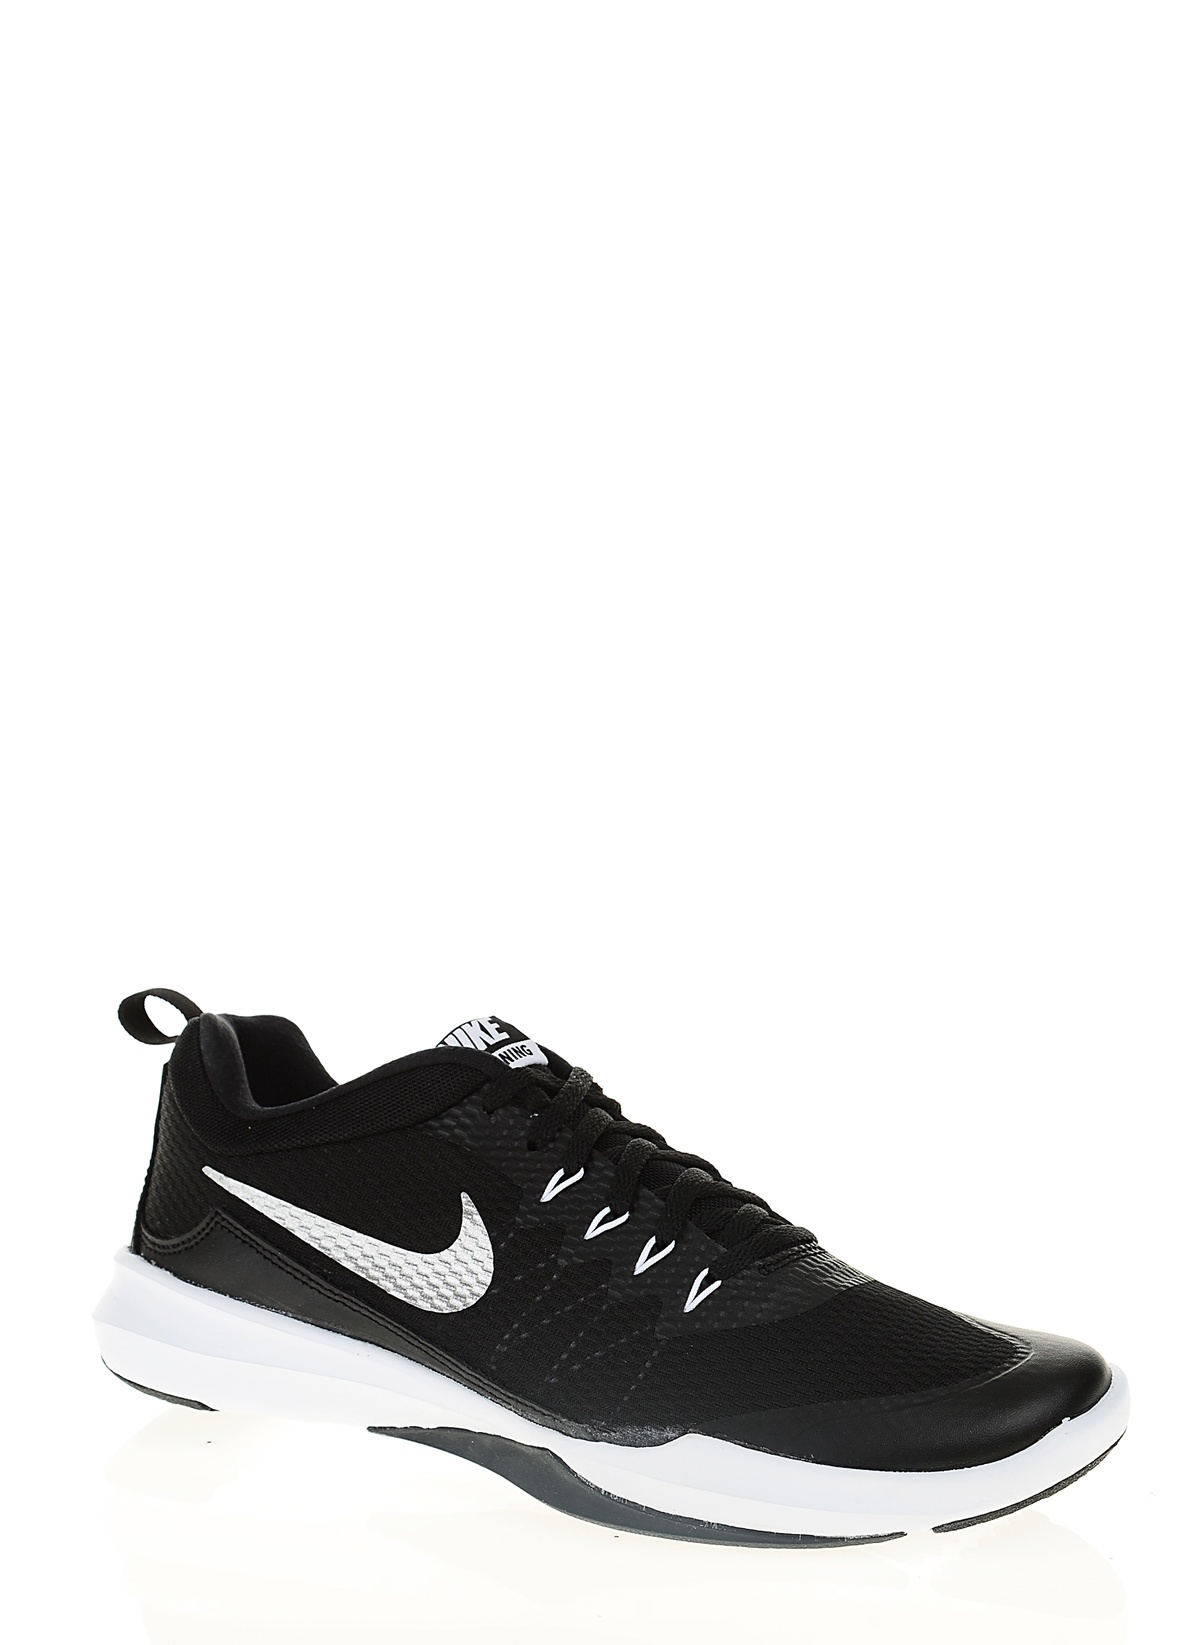 924206 001 Nike Legend Trainer